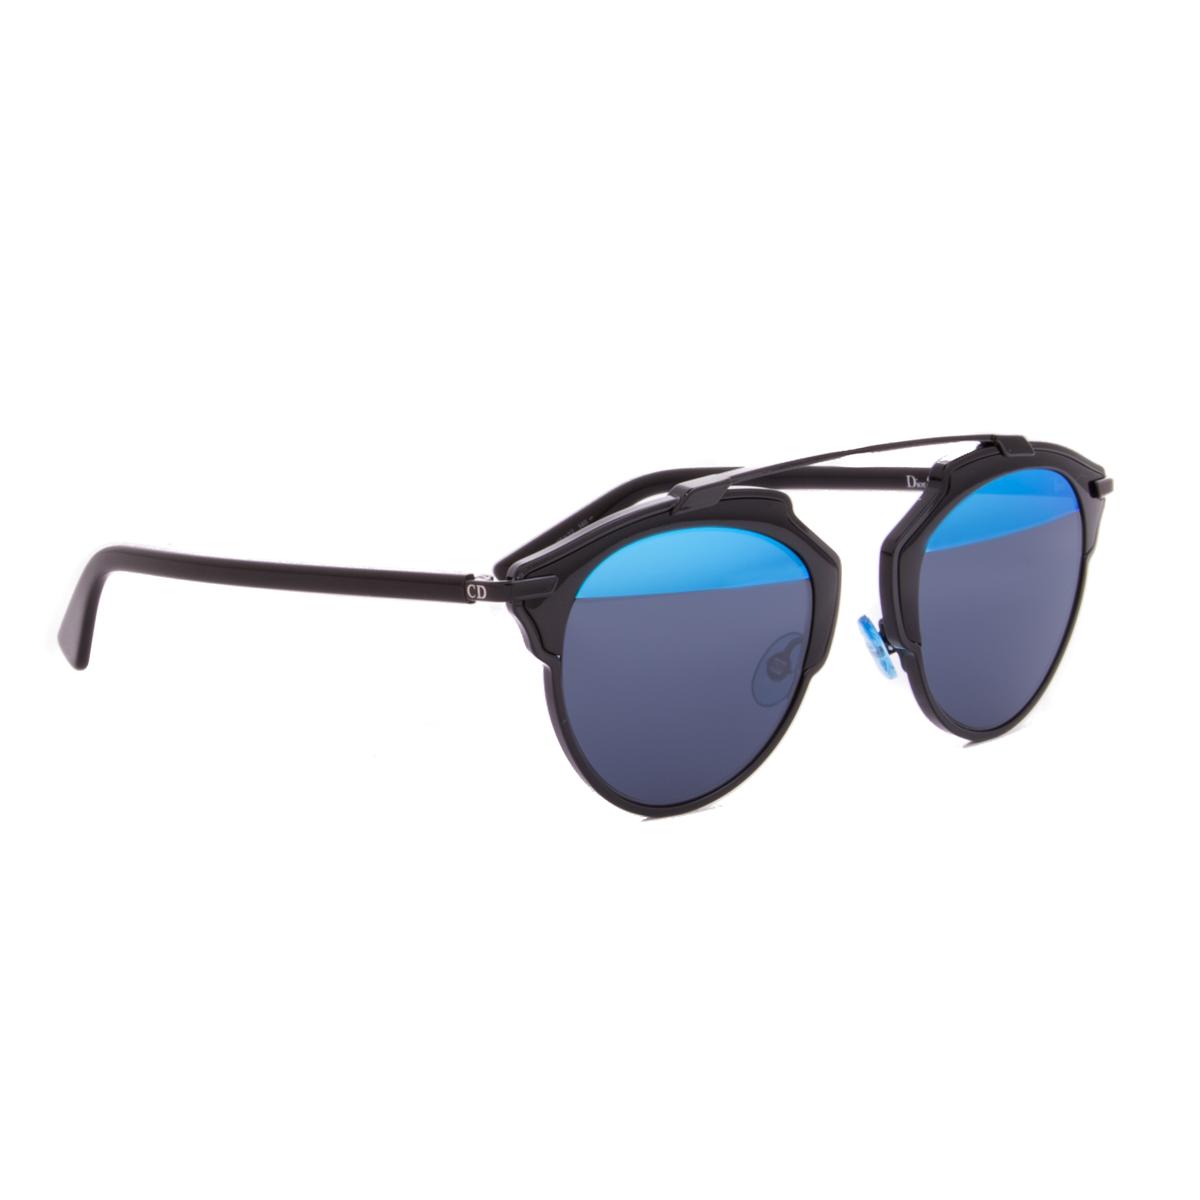 Dior Black Frame Glasses : Christian Dior Sunglasses Dior So Real B0YY0 Black Frame ...